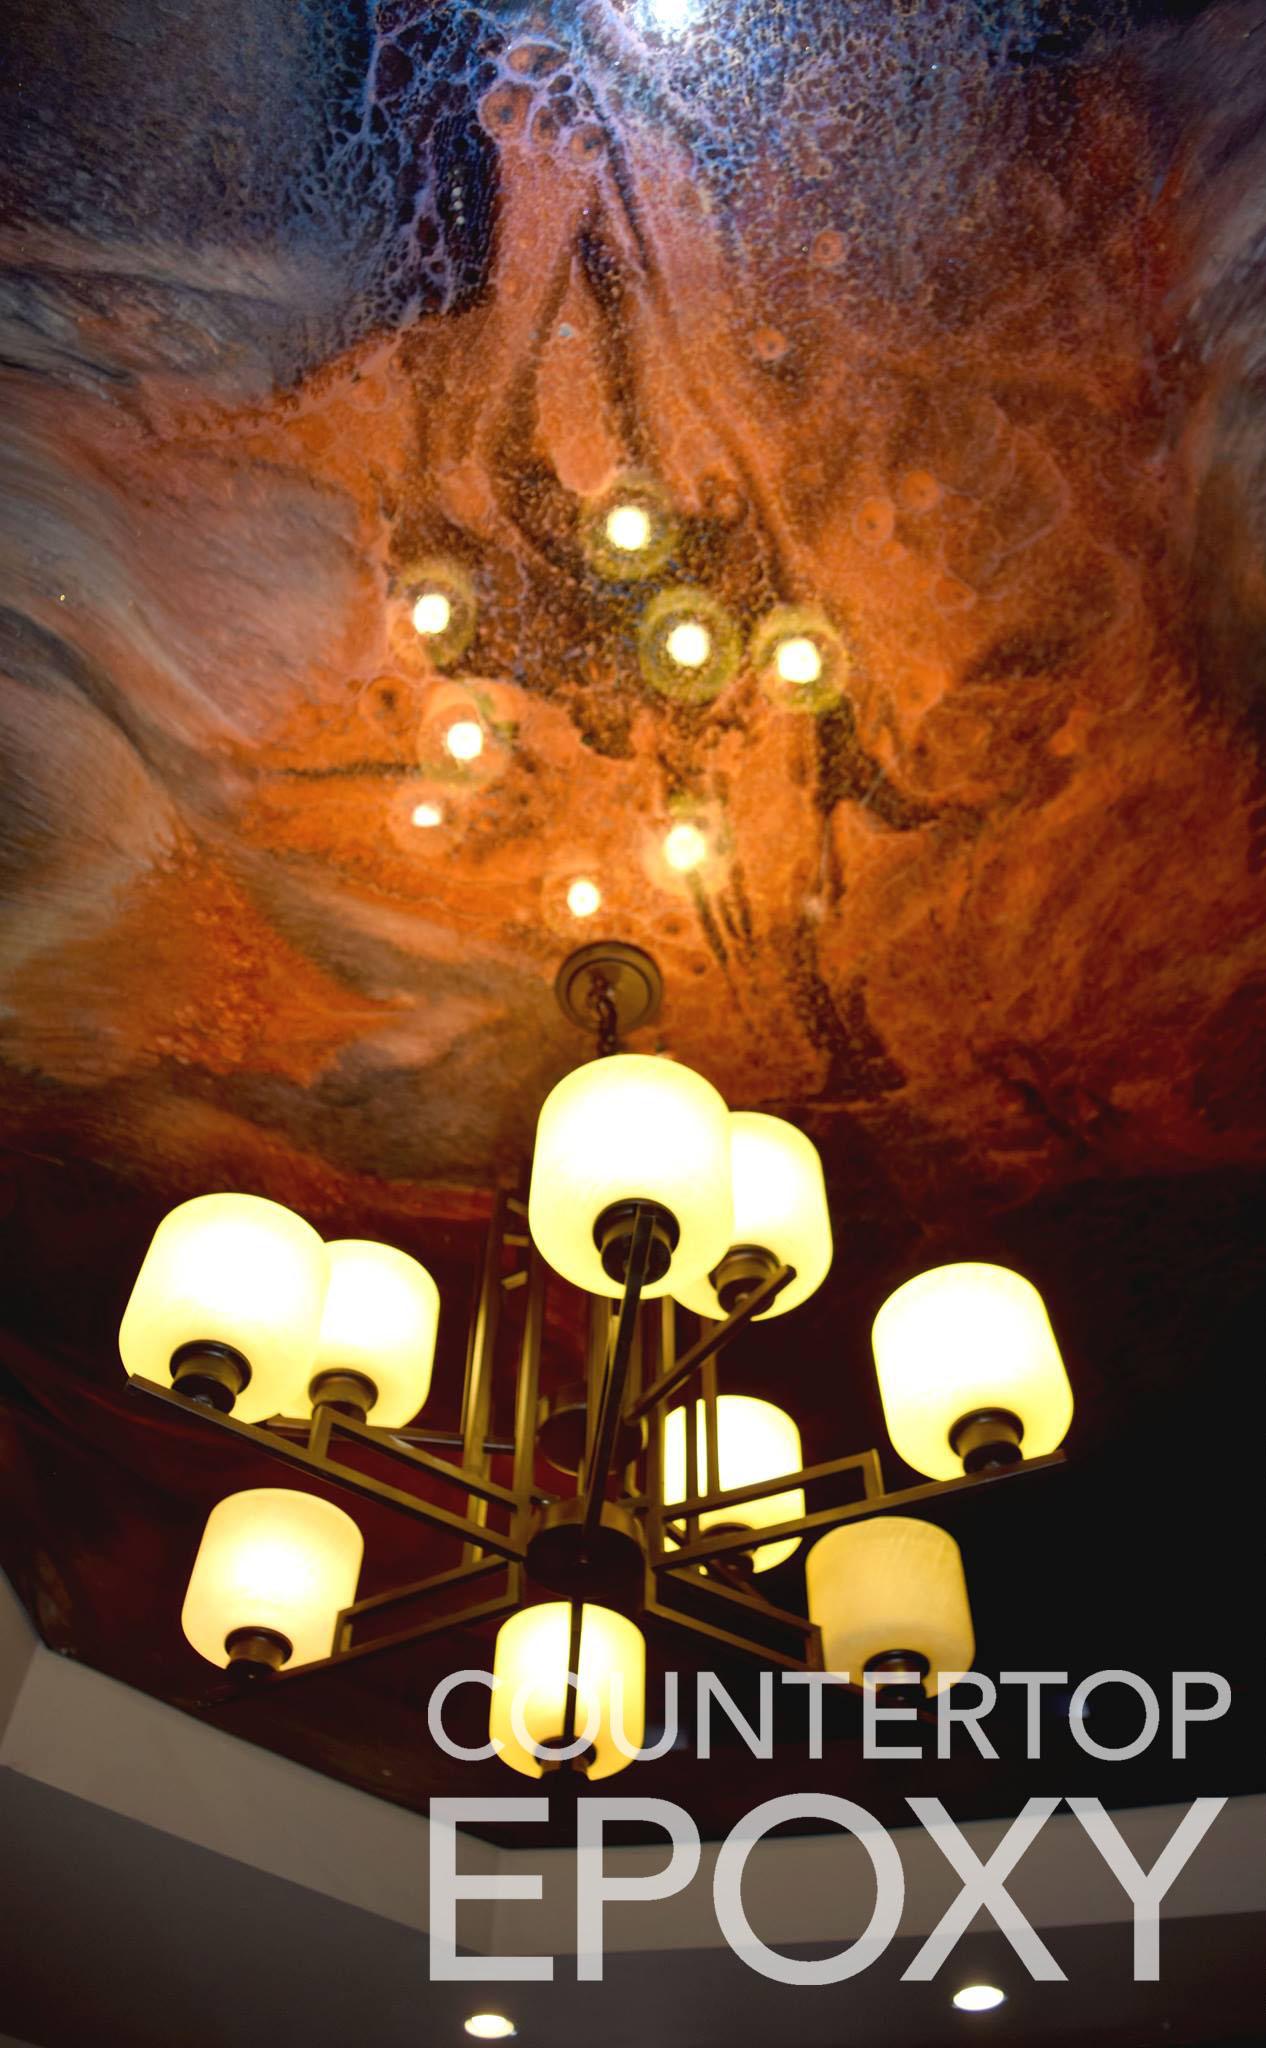 FX Poxy non-sag wall epoxy on ceiling